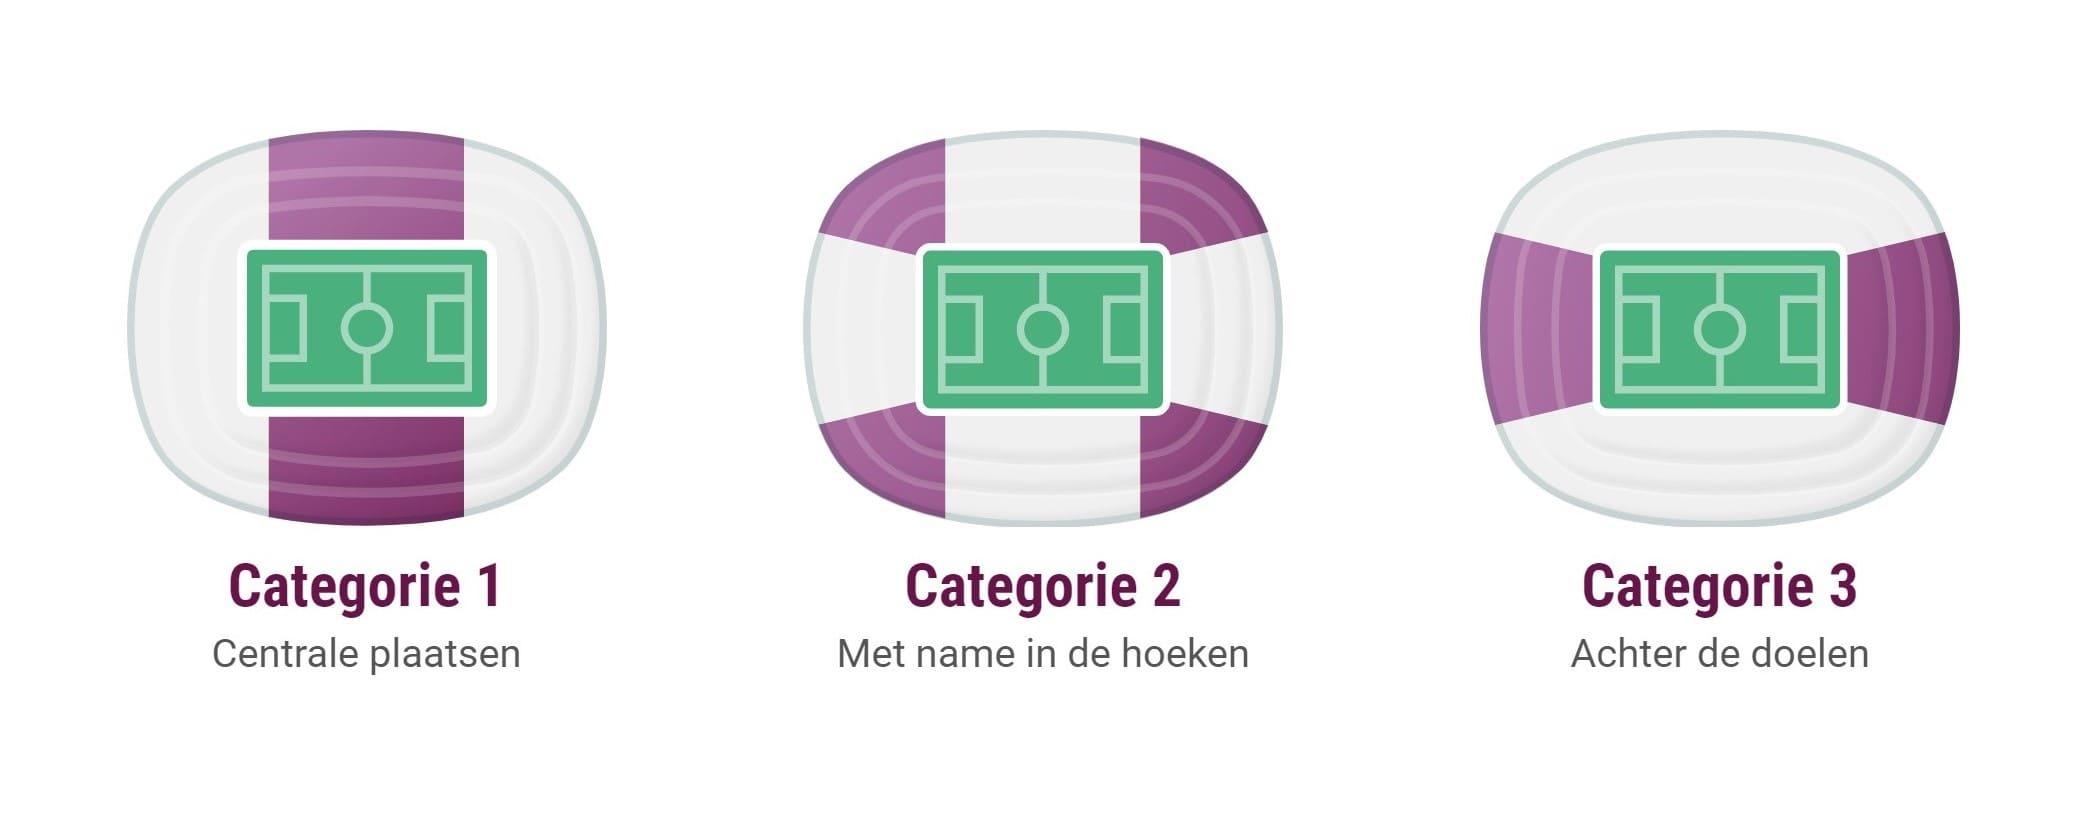 prijs-per-categorie-ek-stadion